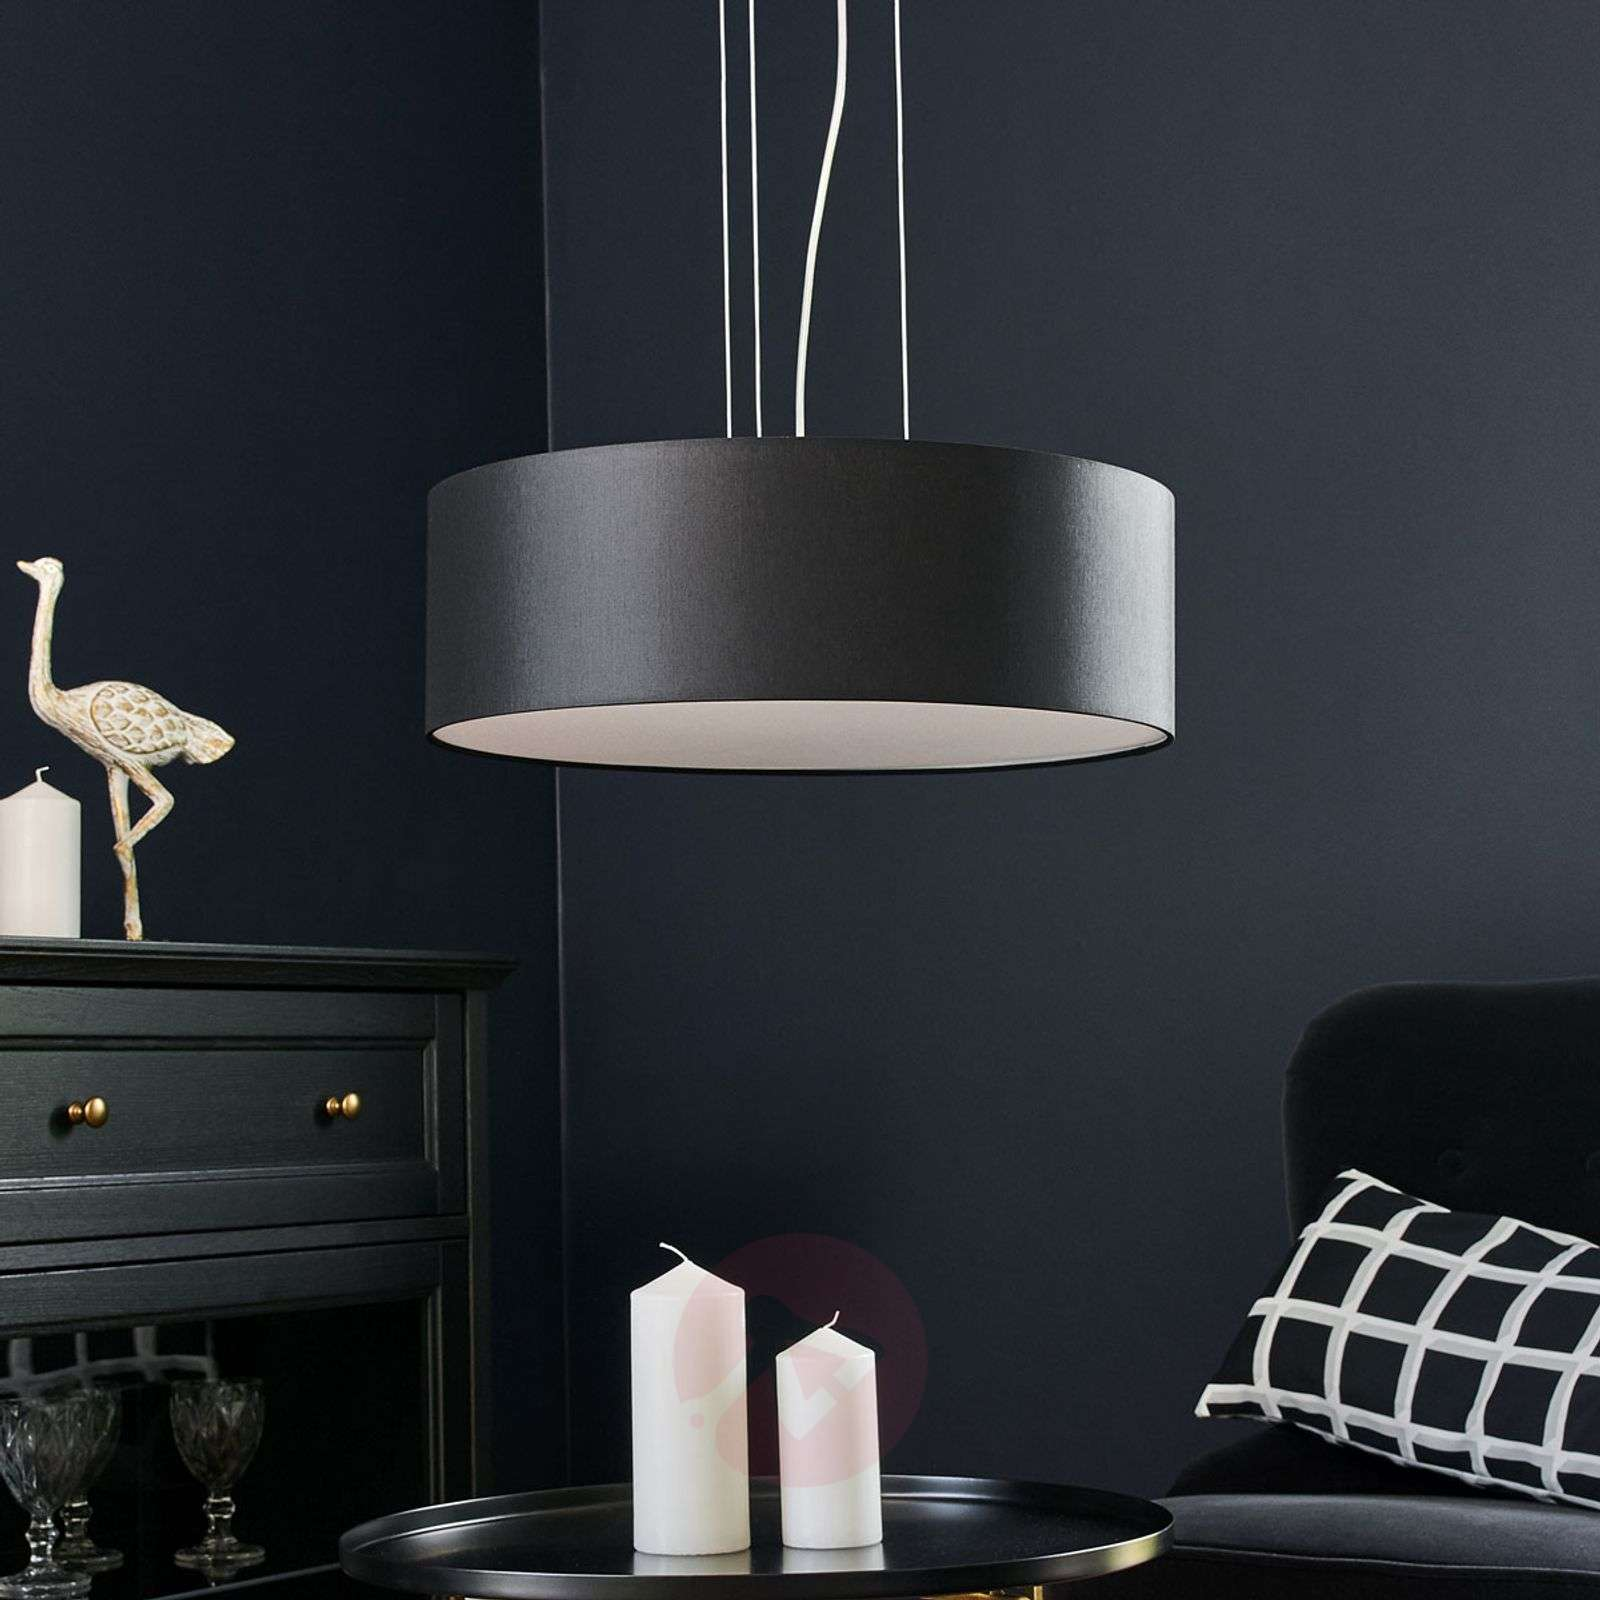 LED-riippuvalo Gala, 50 cm, musta sintsi-6722454-01